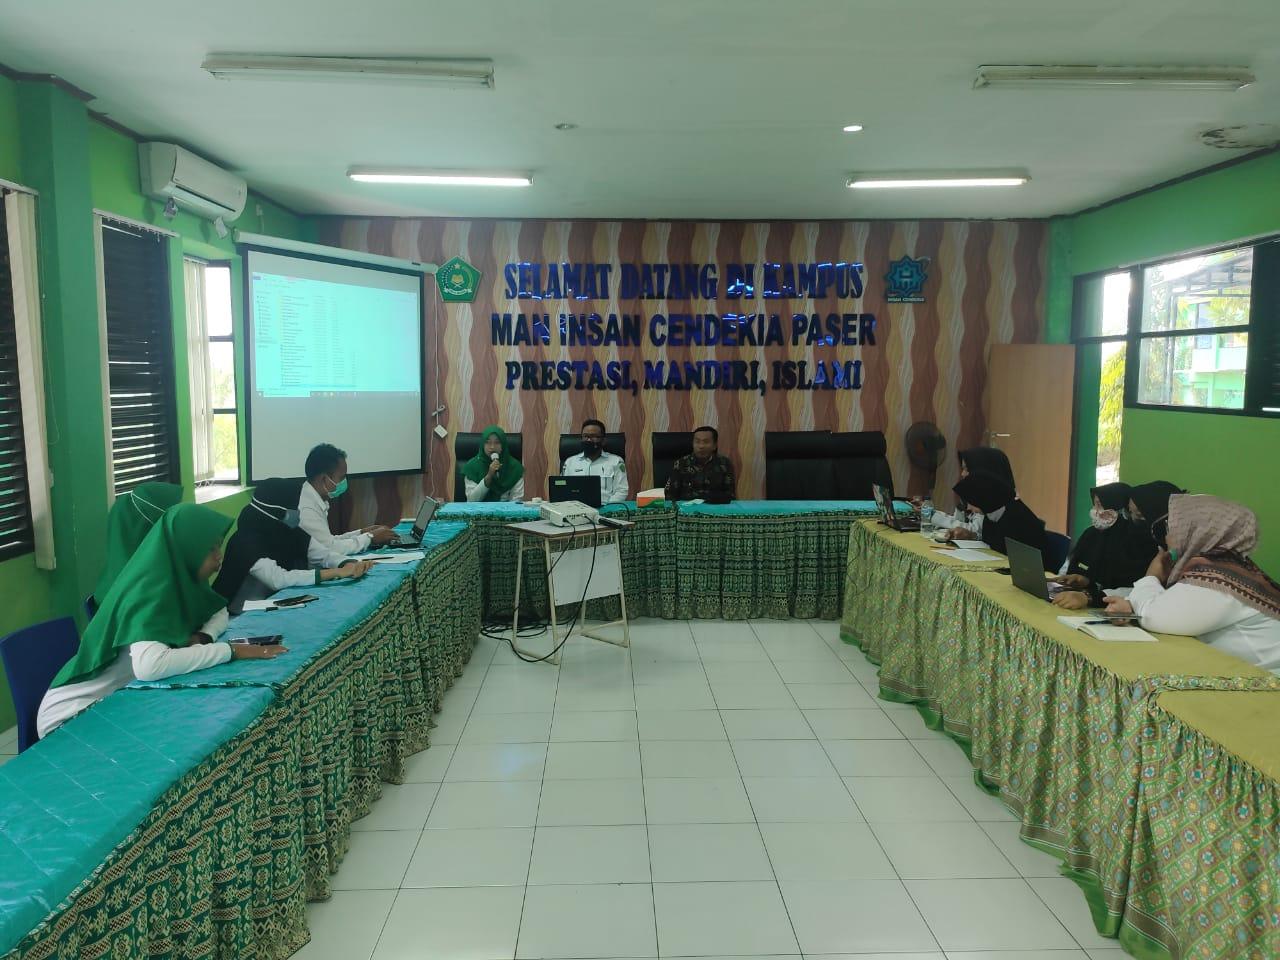 Tingkatkan Sinergisitas, Kamad Gelar Rapat dengan Tim Humas MAN IC Paser